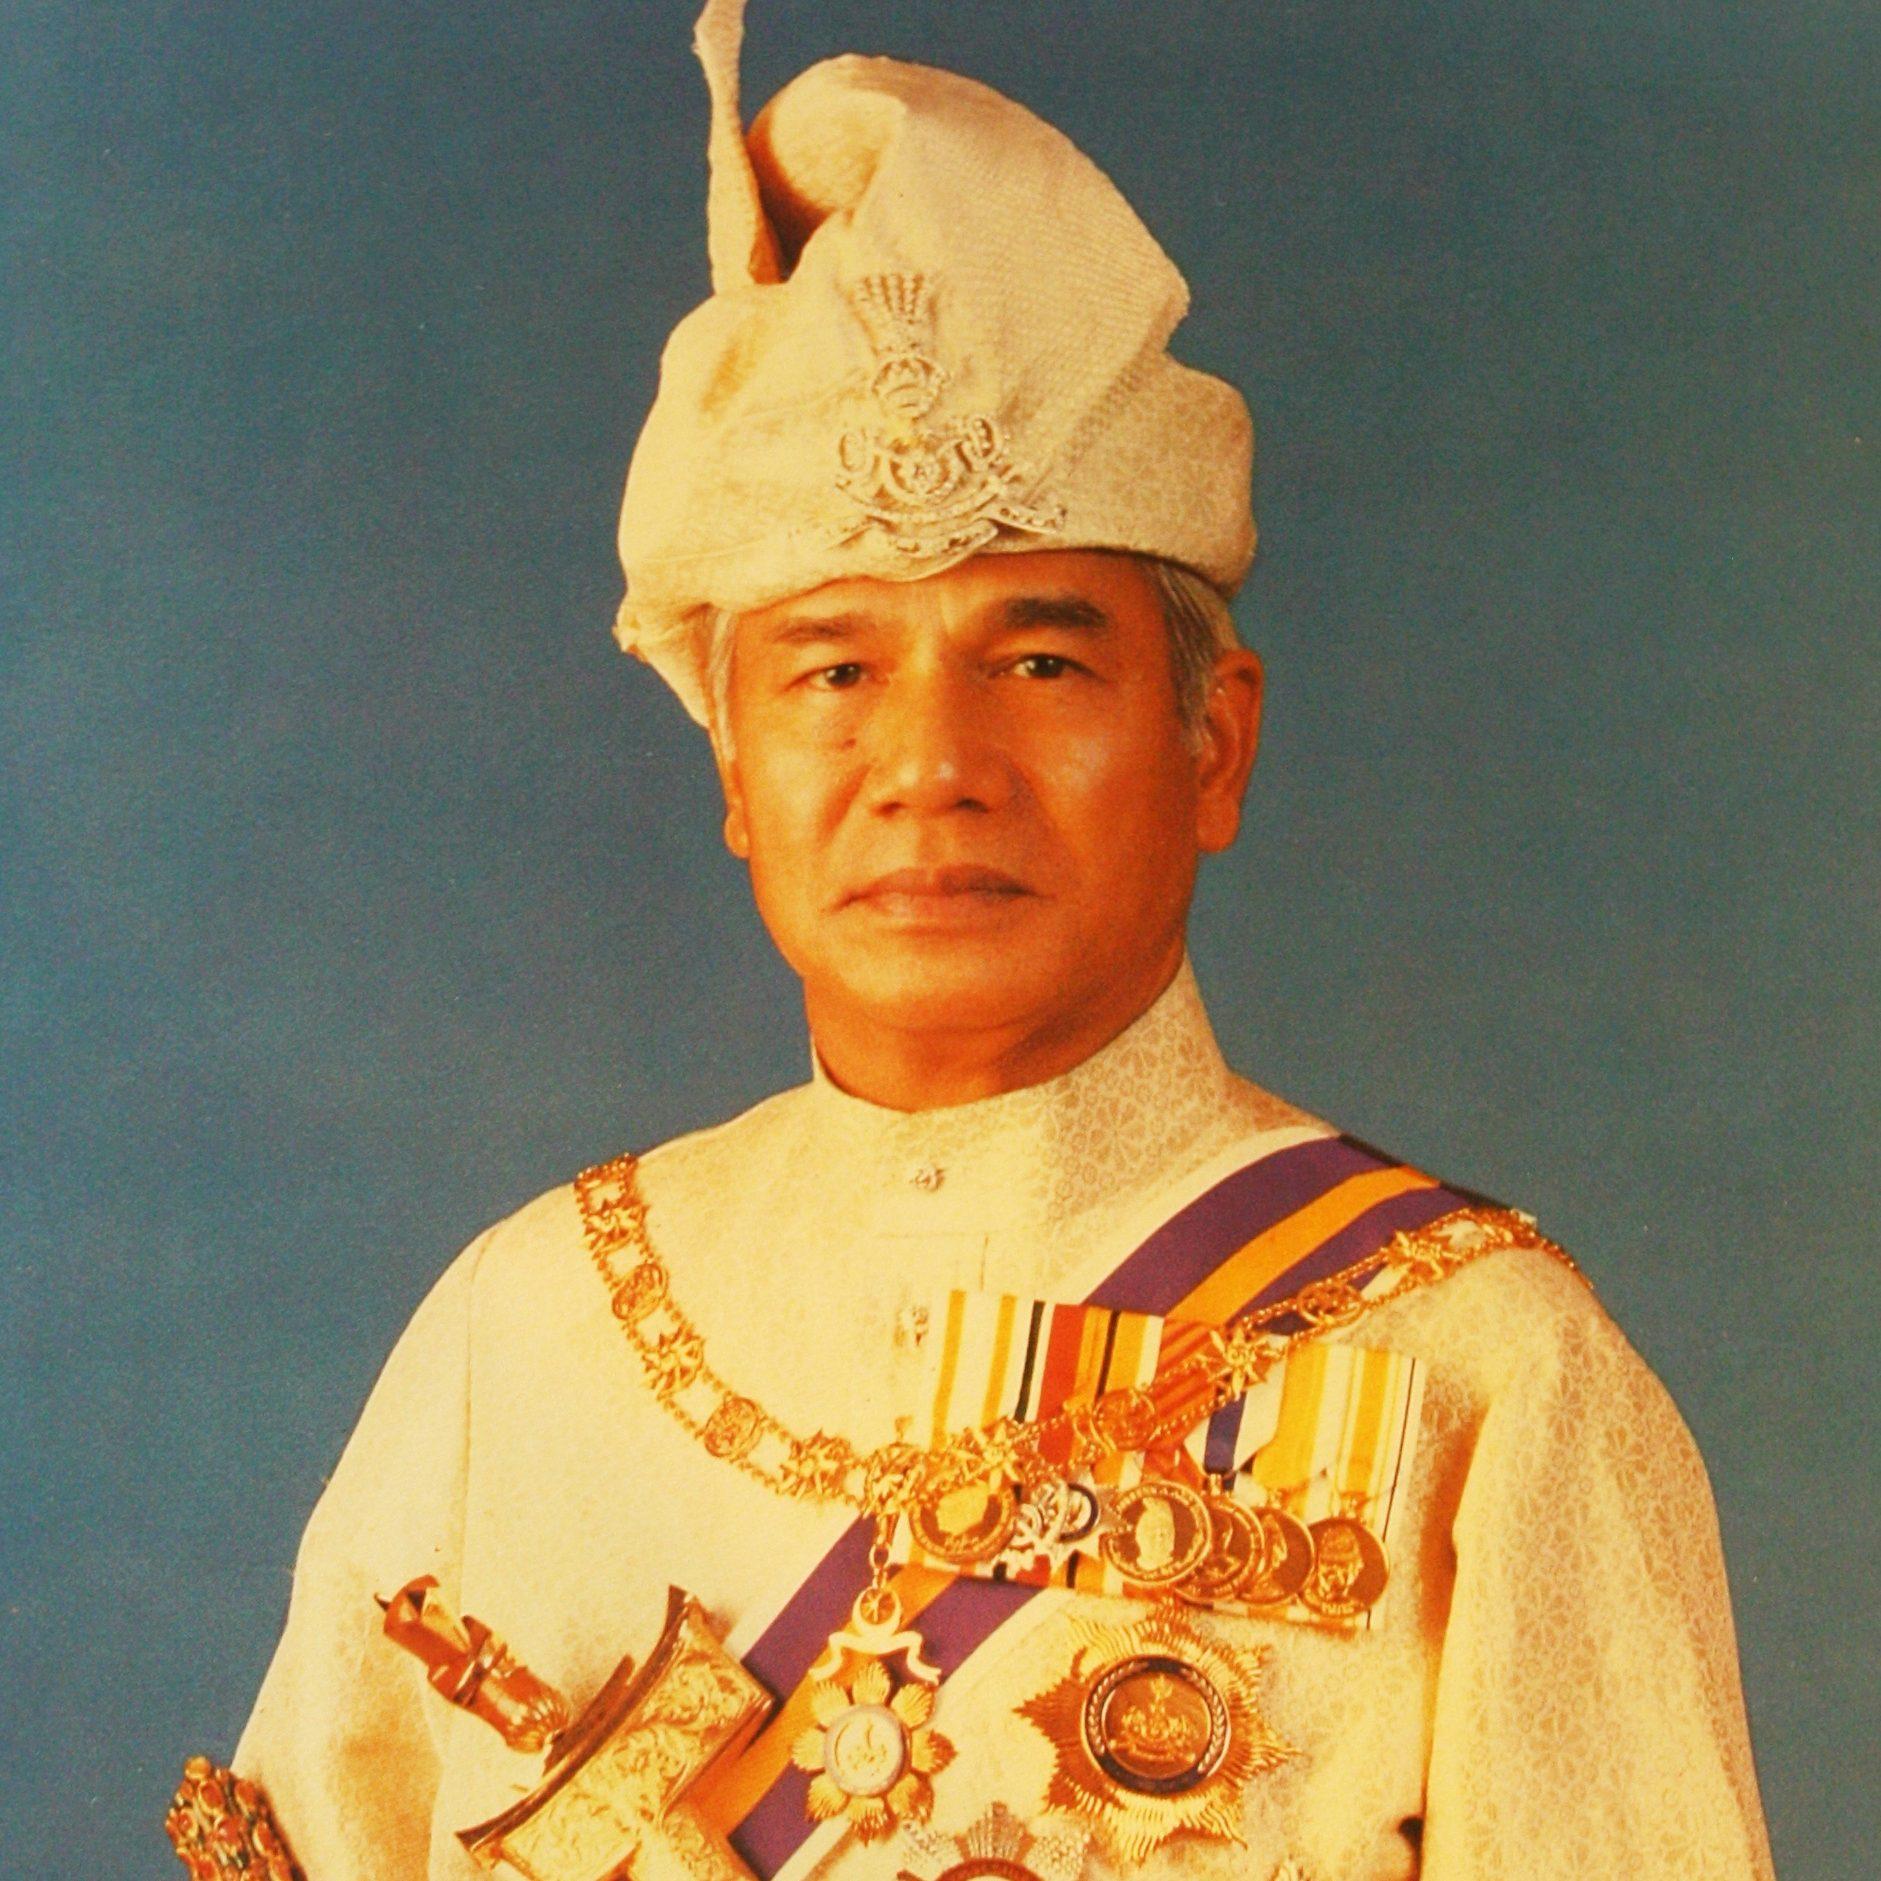 Sultan Azlan Muhibbuddin Shah Ibni Almarhum Sultan Yussuff Izzuddin Shah Ghafarullahu-lah